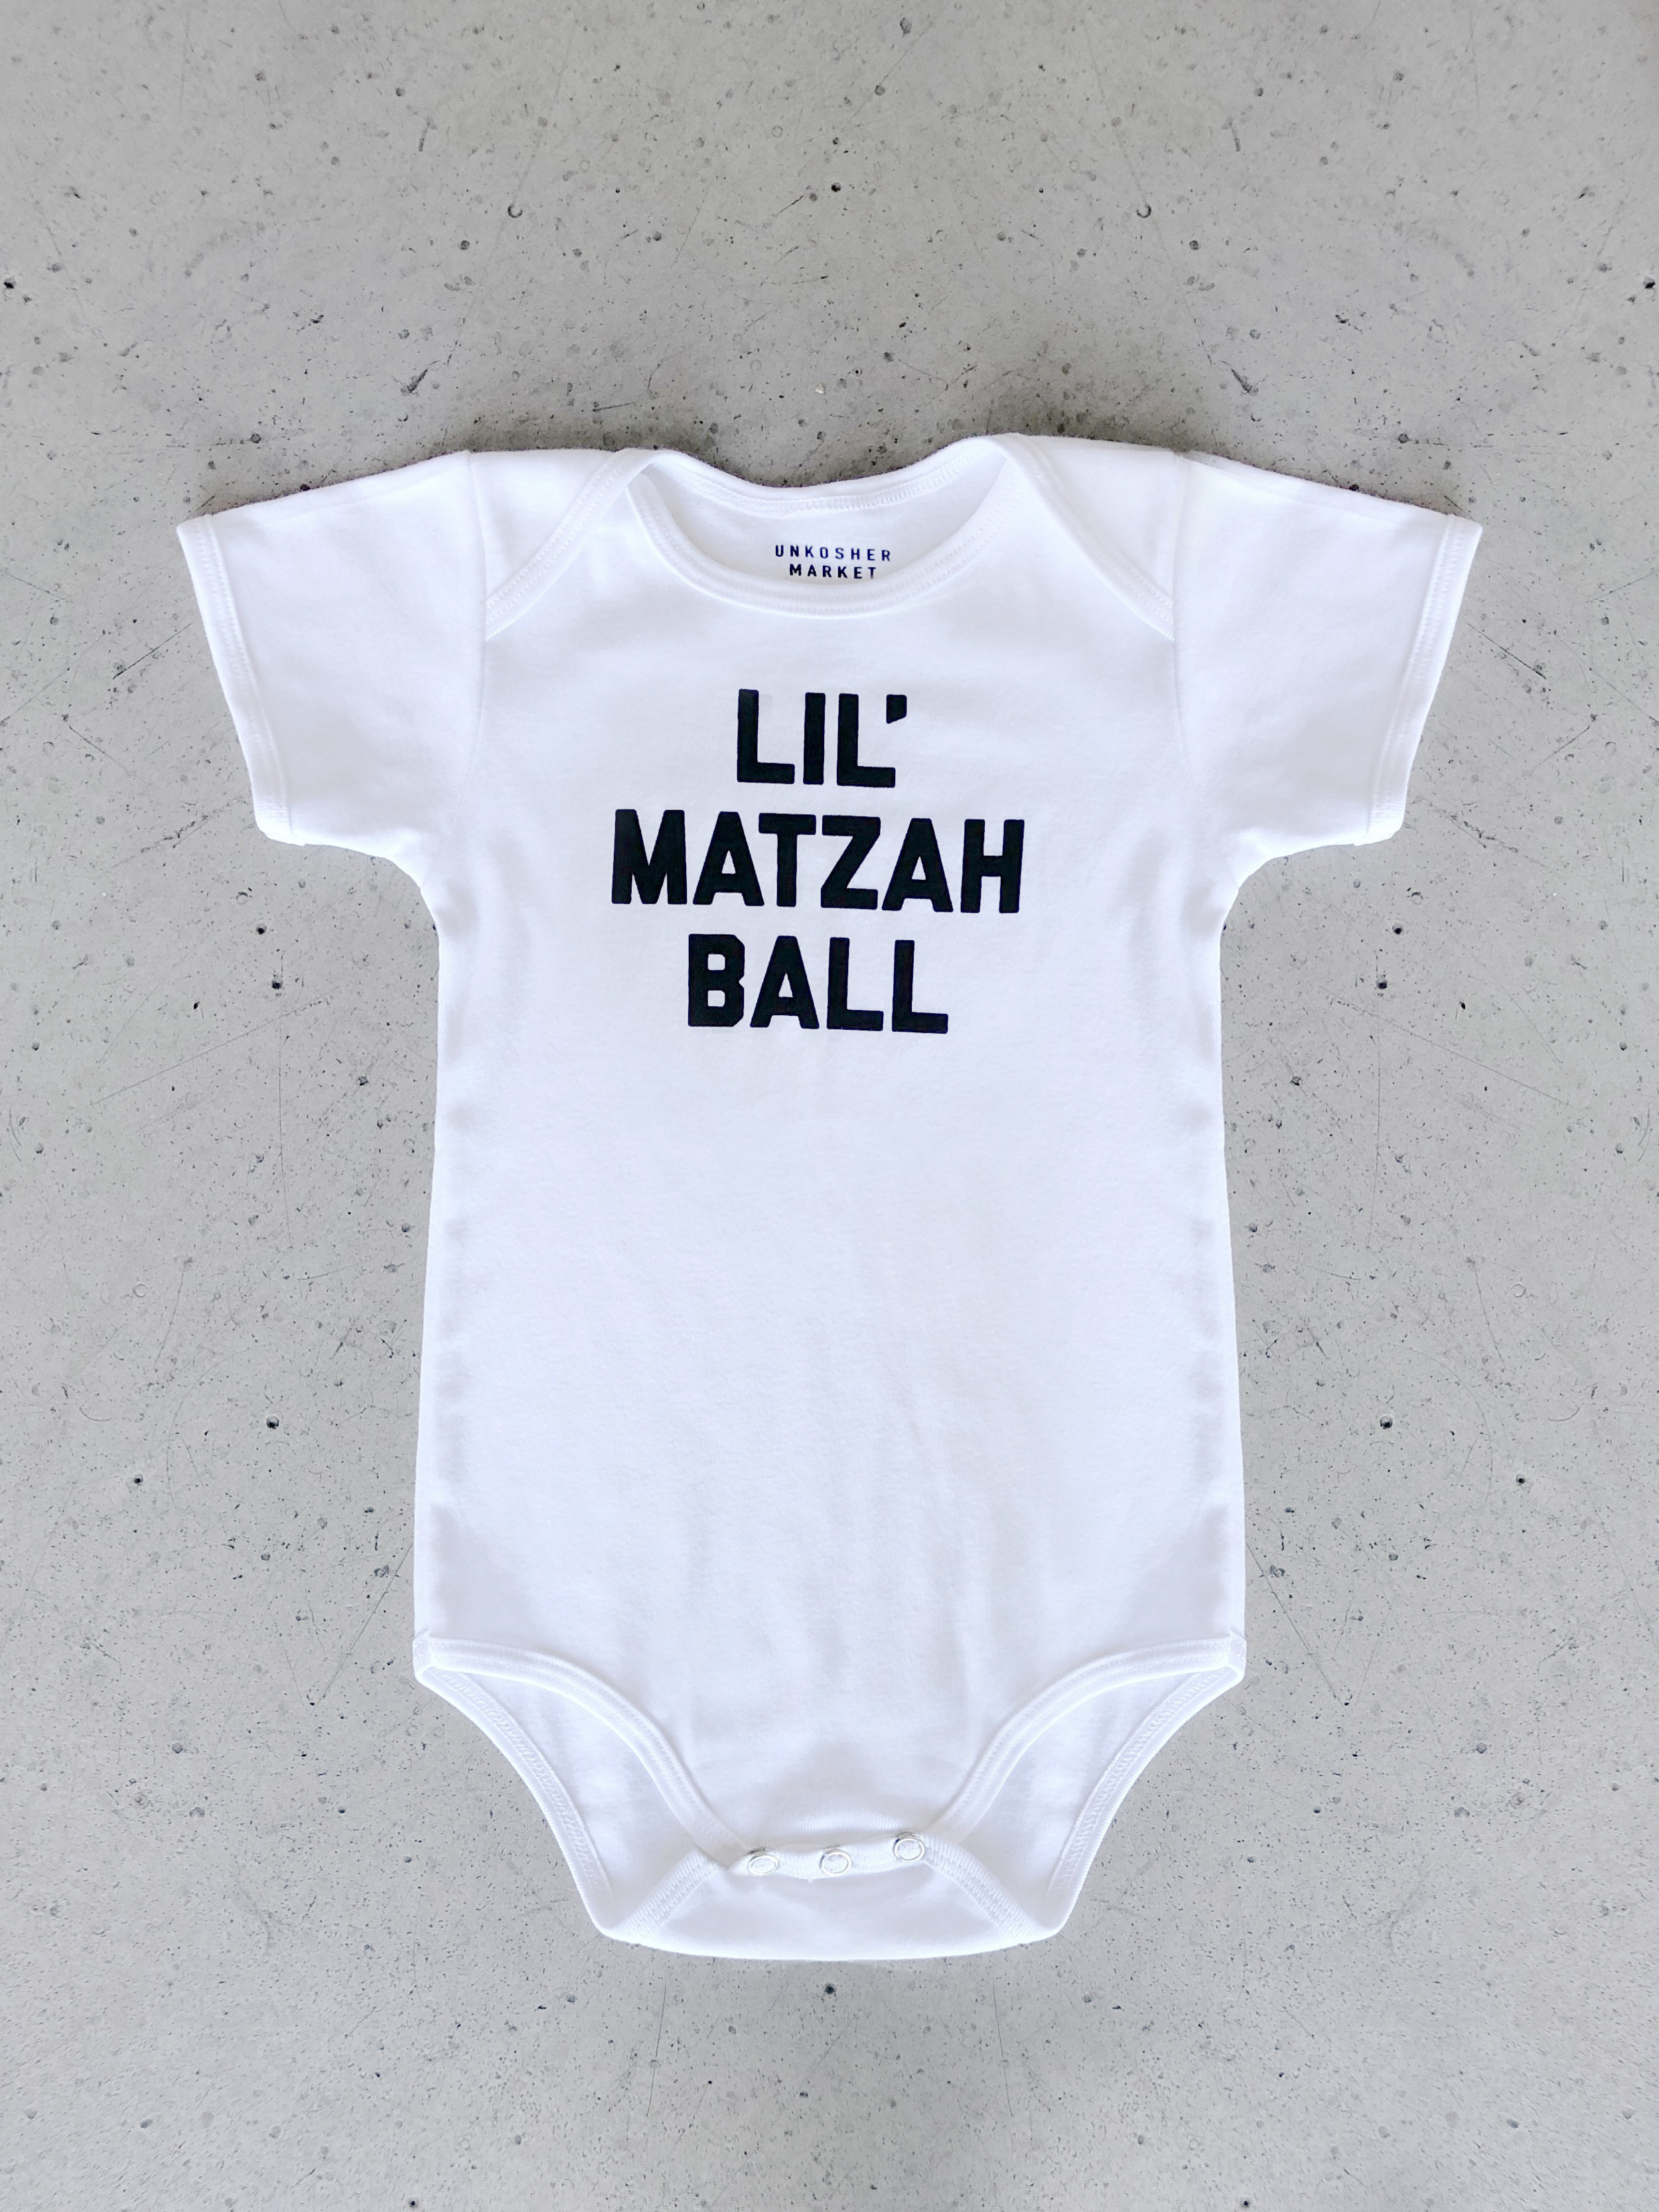 98e8b2bc7 Amazon: Baby Registry